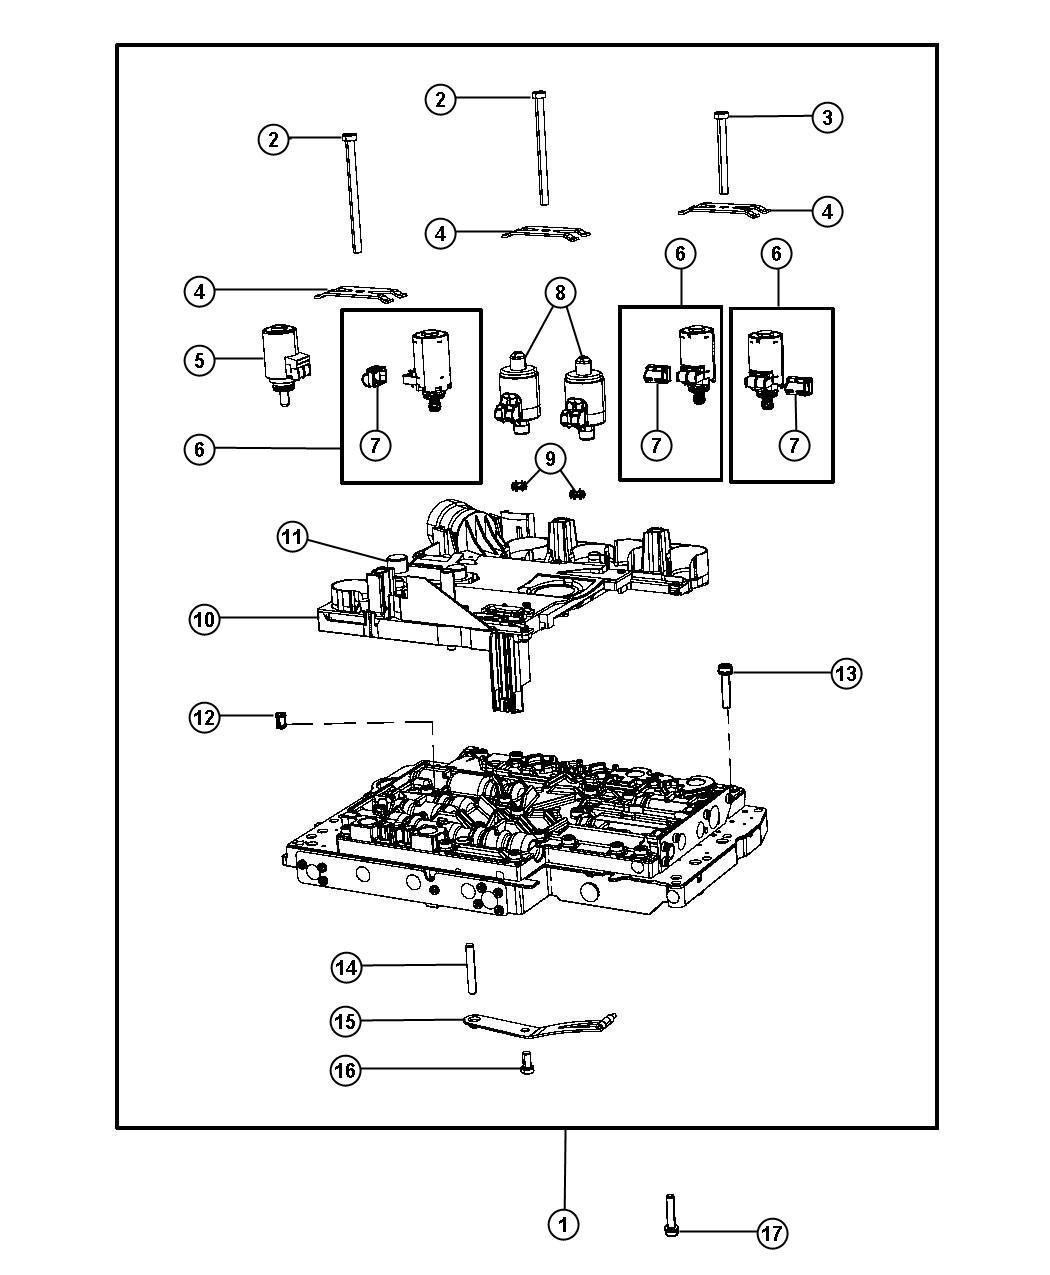 Jeep Wrangler Solenoid Valve Transmission